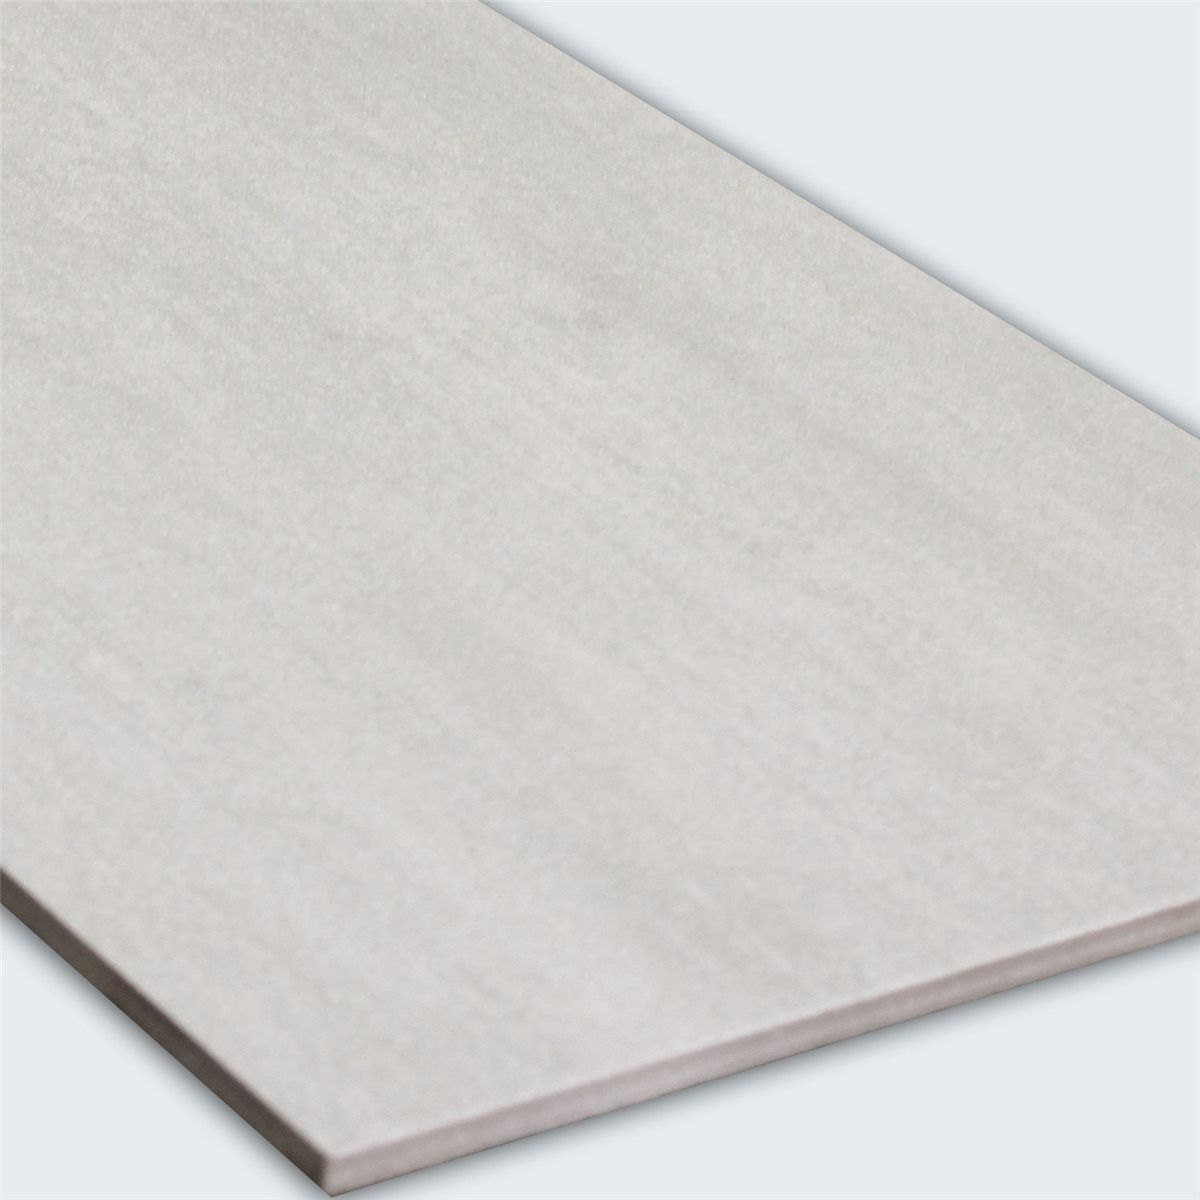 Lappato Quartzite Semi Polished Bianca - 1 Package HT99262 £21.97/m2  +4940797508922